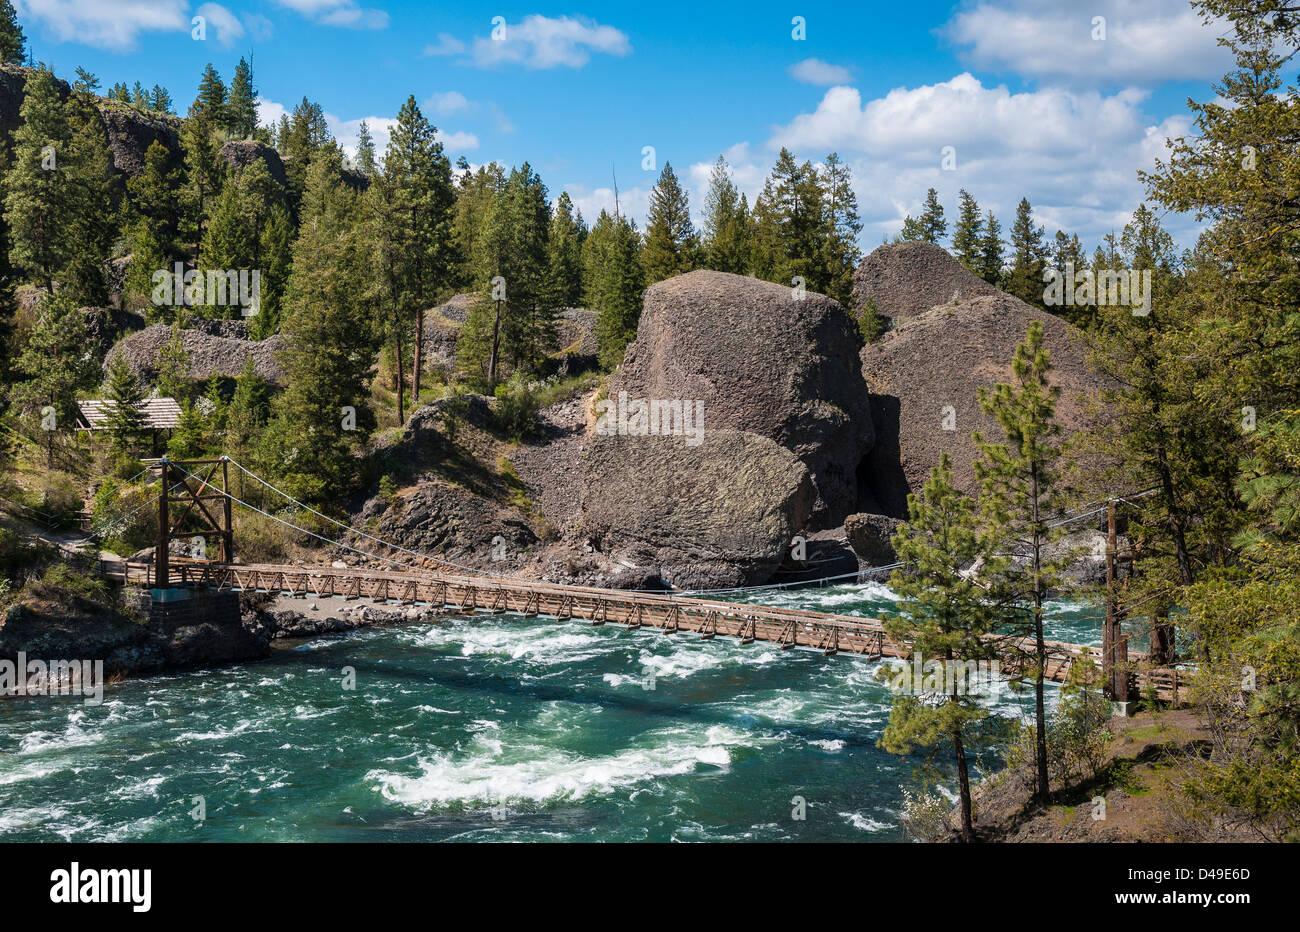 Spokane River at Bowl & Pitcher area of Riverside State Park; Spokane, Washington. Stock Photo